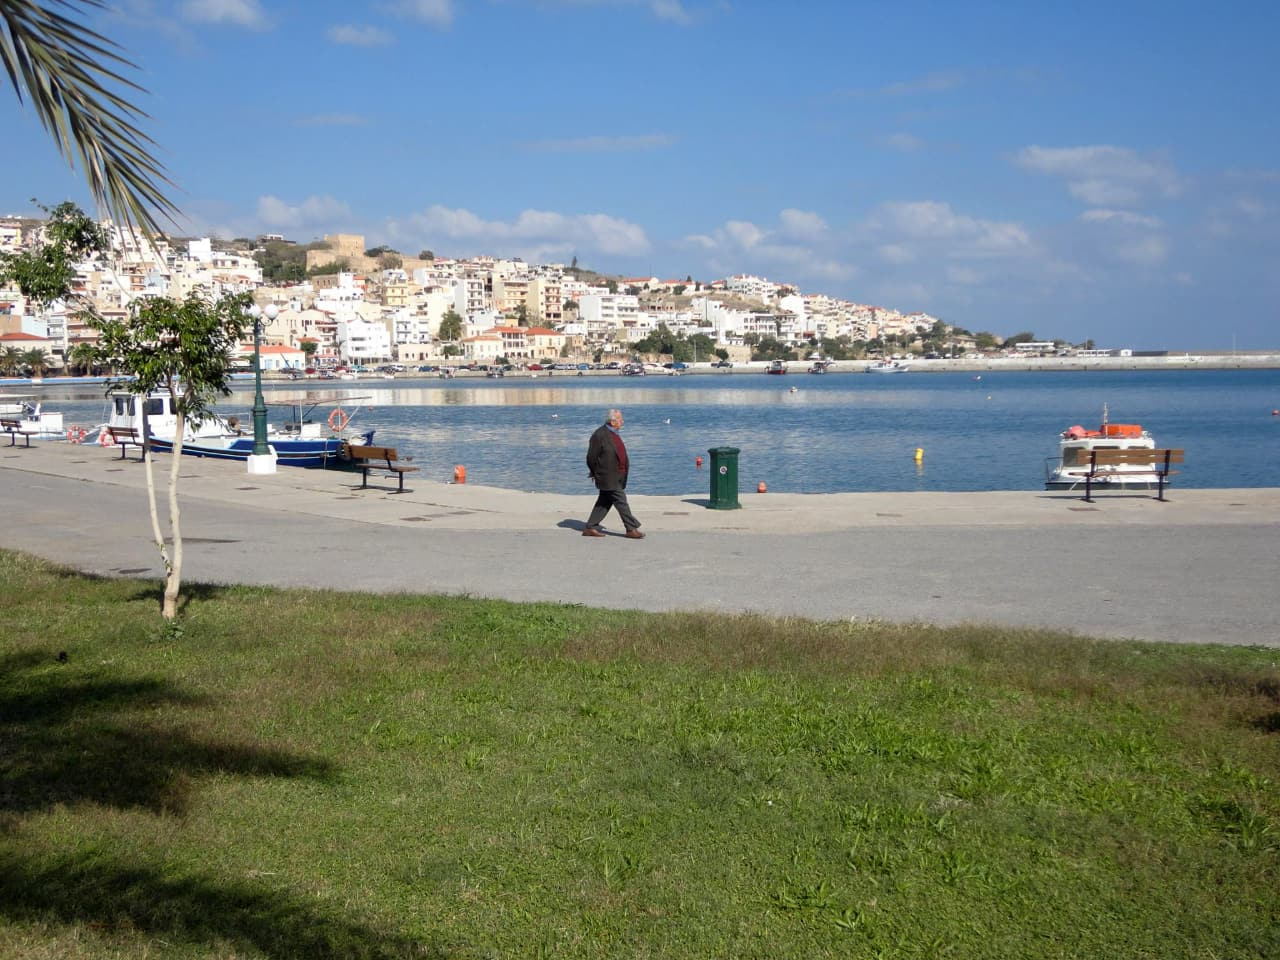 sitia travel guide, sitia town travel tips, sitia crete holidays, crete travel sitia, sitia hotels, things to do siita, where to stay sitia, where to eat sitia, summer holidays sitia